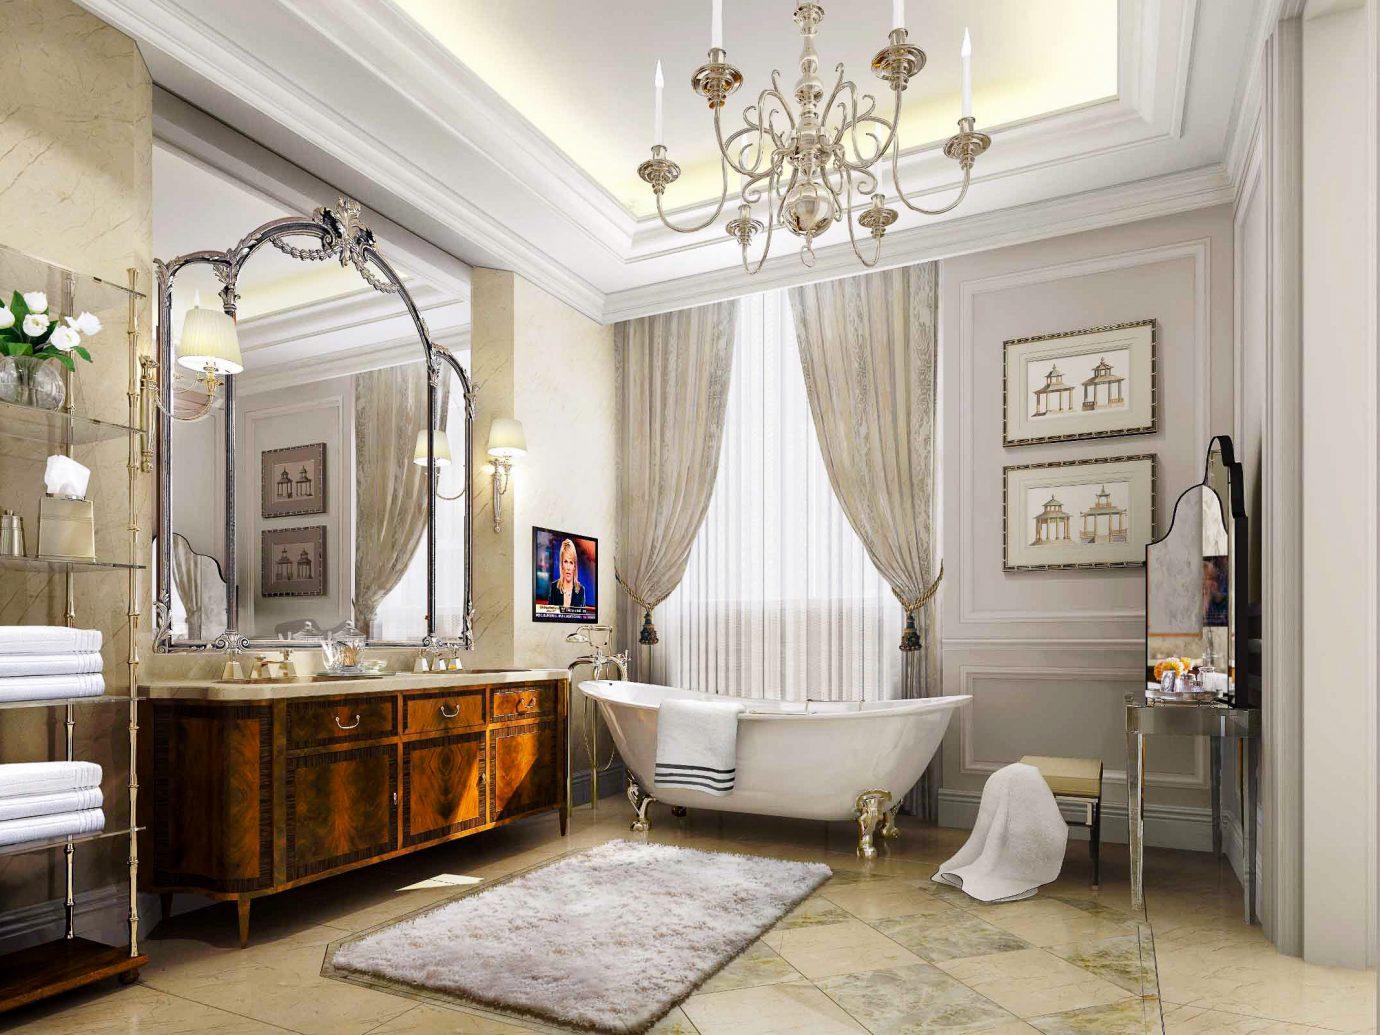 Boutique Hotels Luxury Travel indoor floor wall room interior design ceiling bathroom home living room estate flooring real estate window interior designer furniture